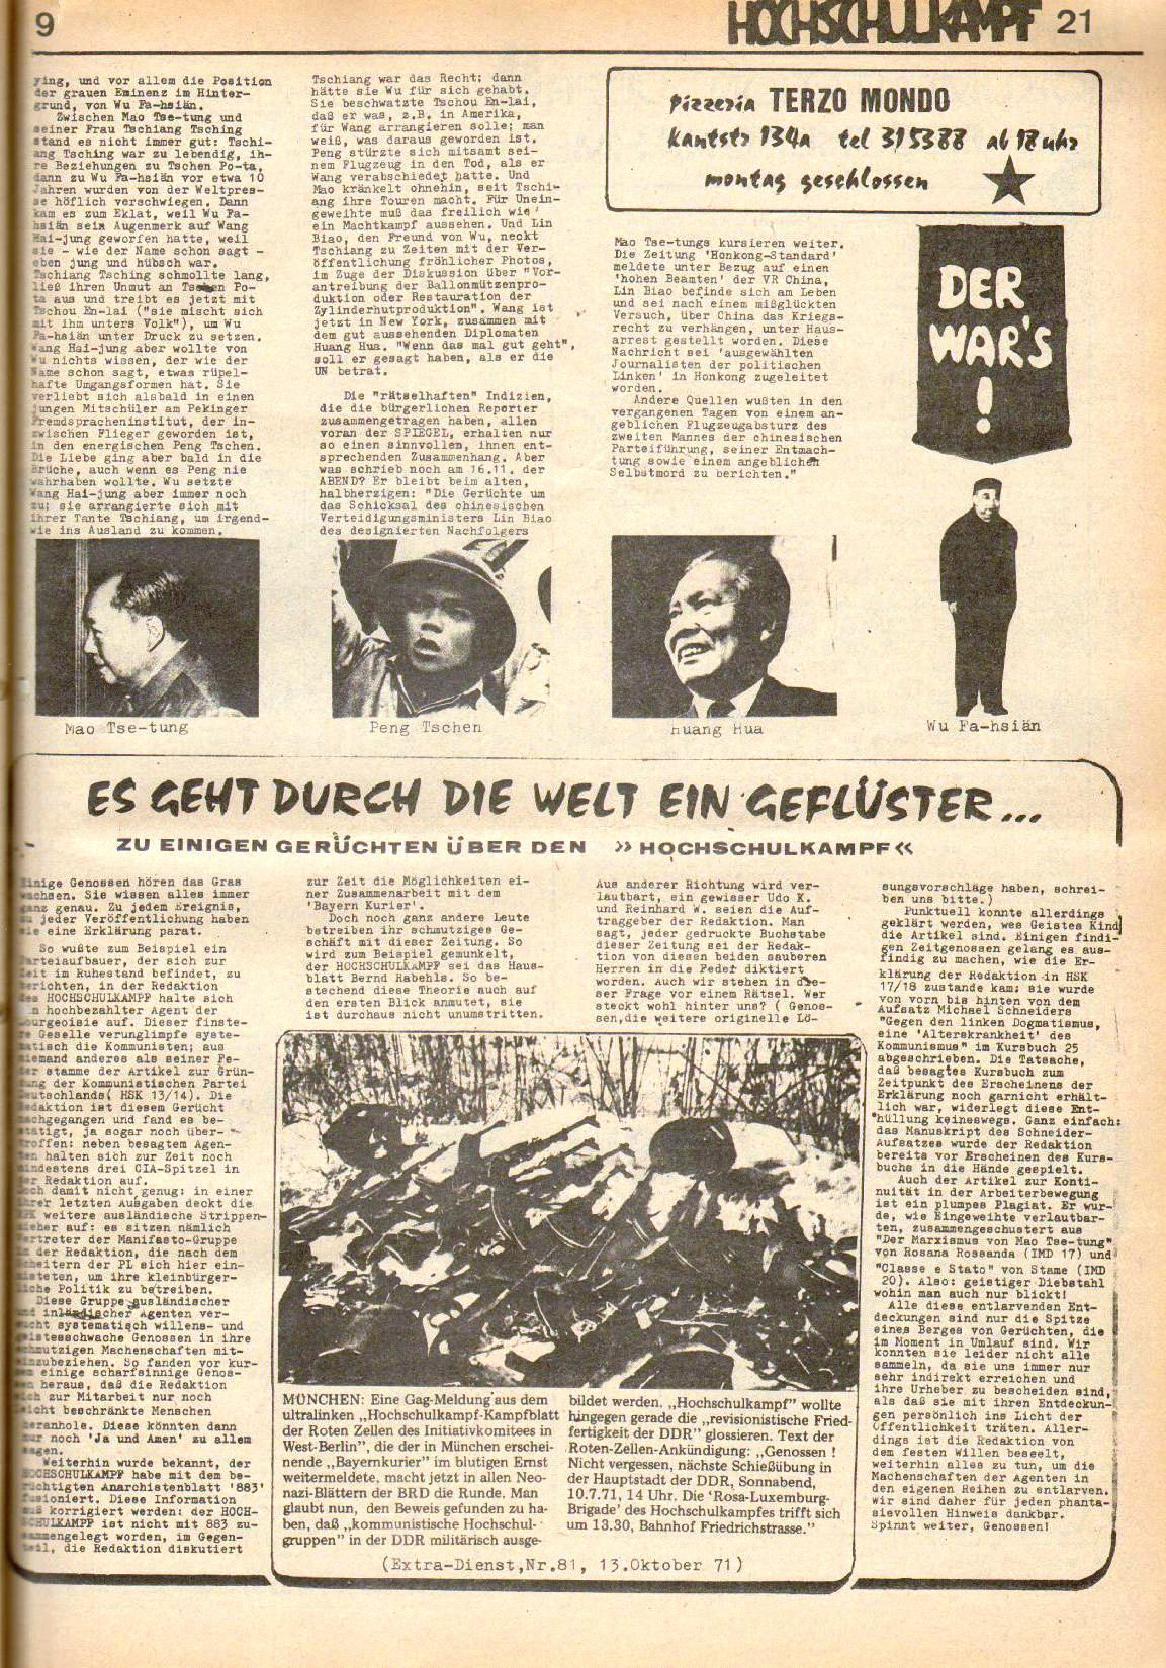 Berlin_Hochschulkampf_1971_21_11